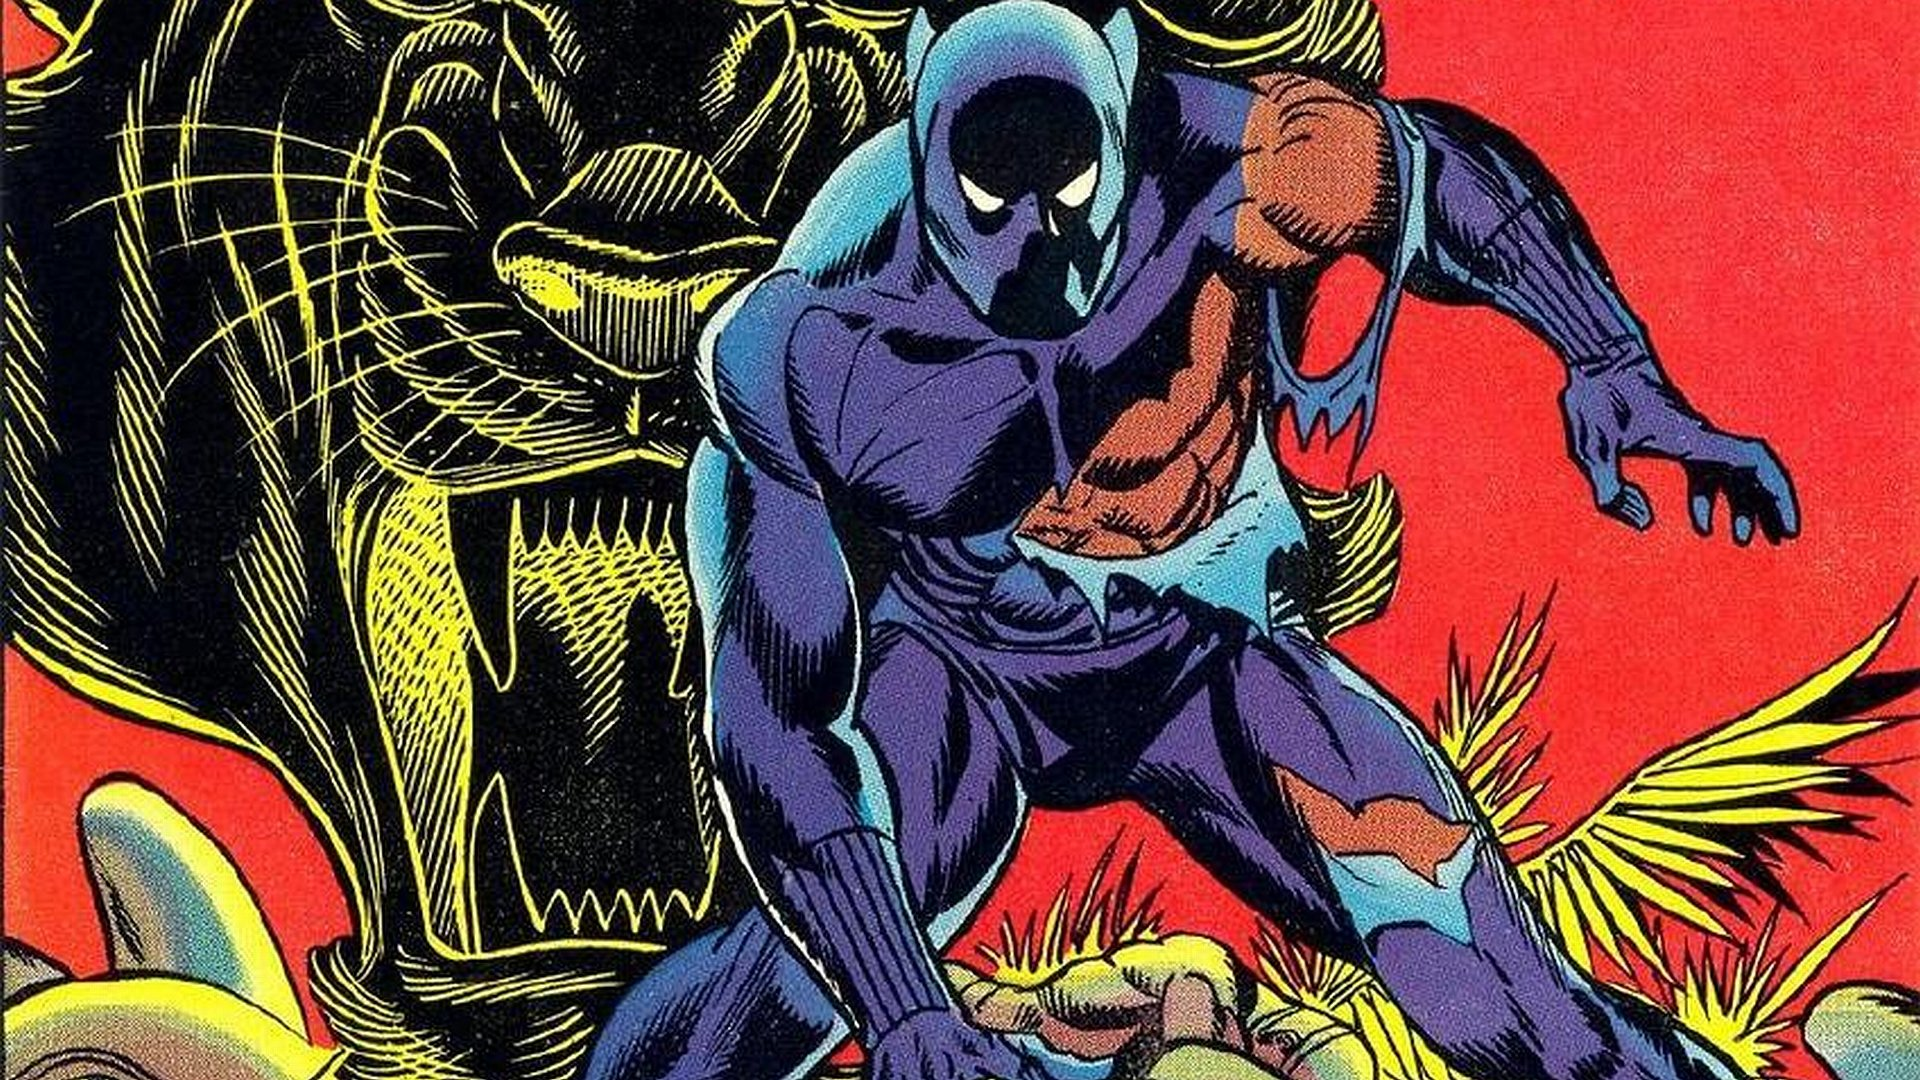 Black Panther Marvel Wallpapers 1920x1080 Full Hd 1080p Desktop Backgrounds